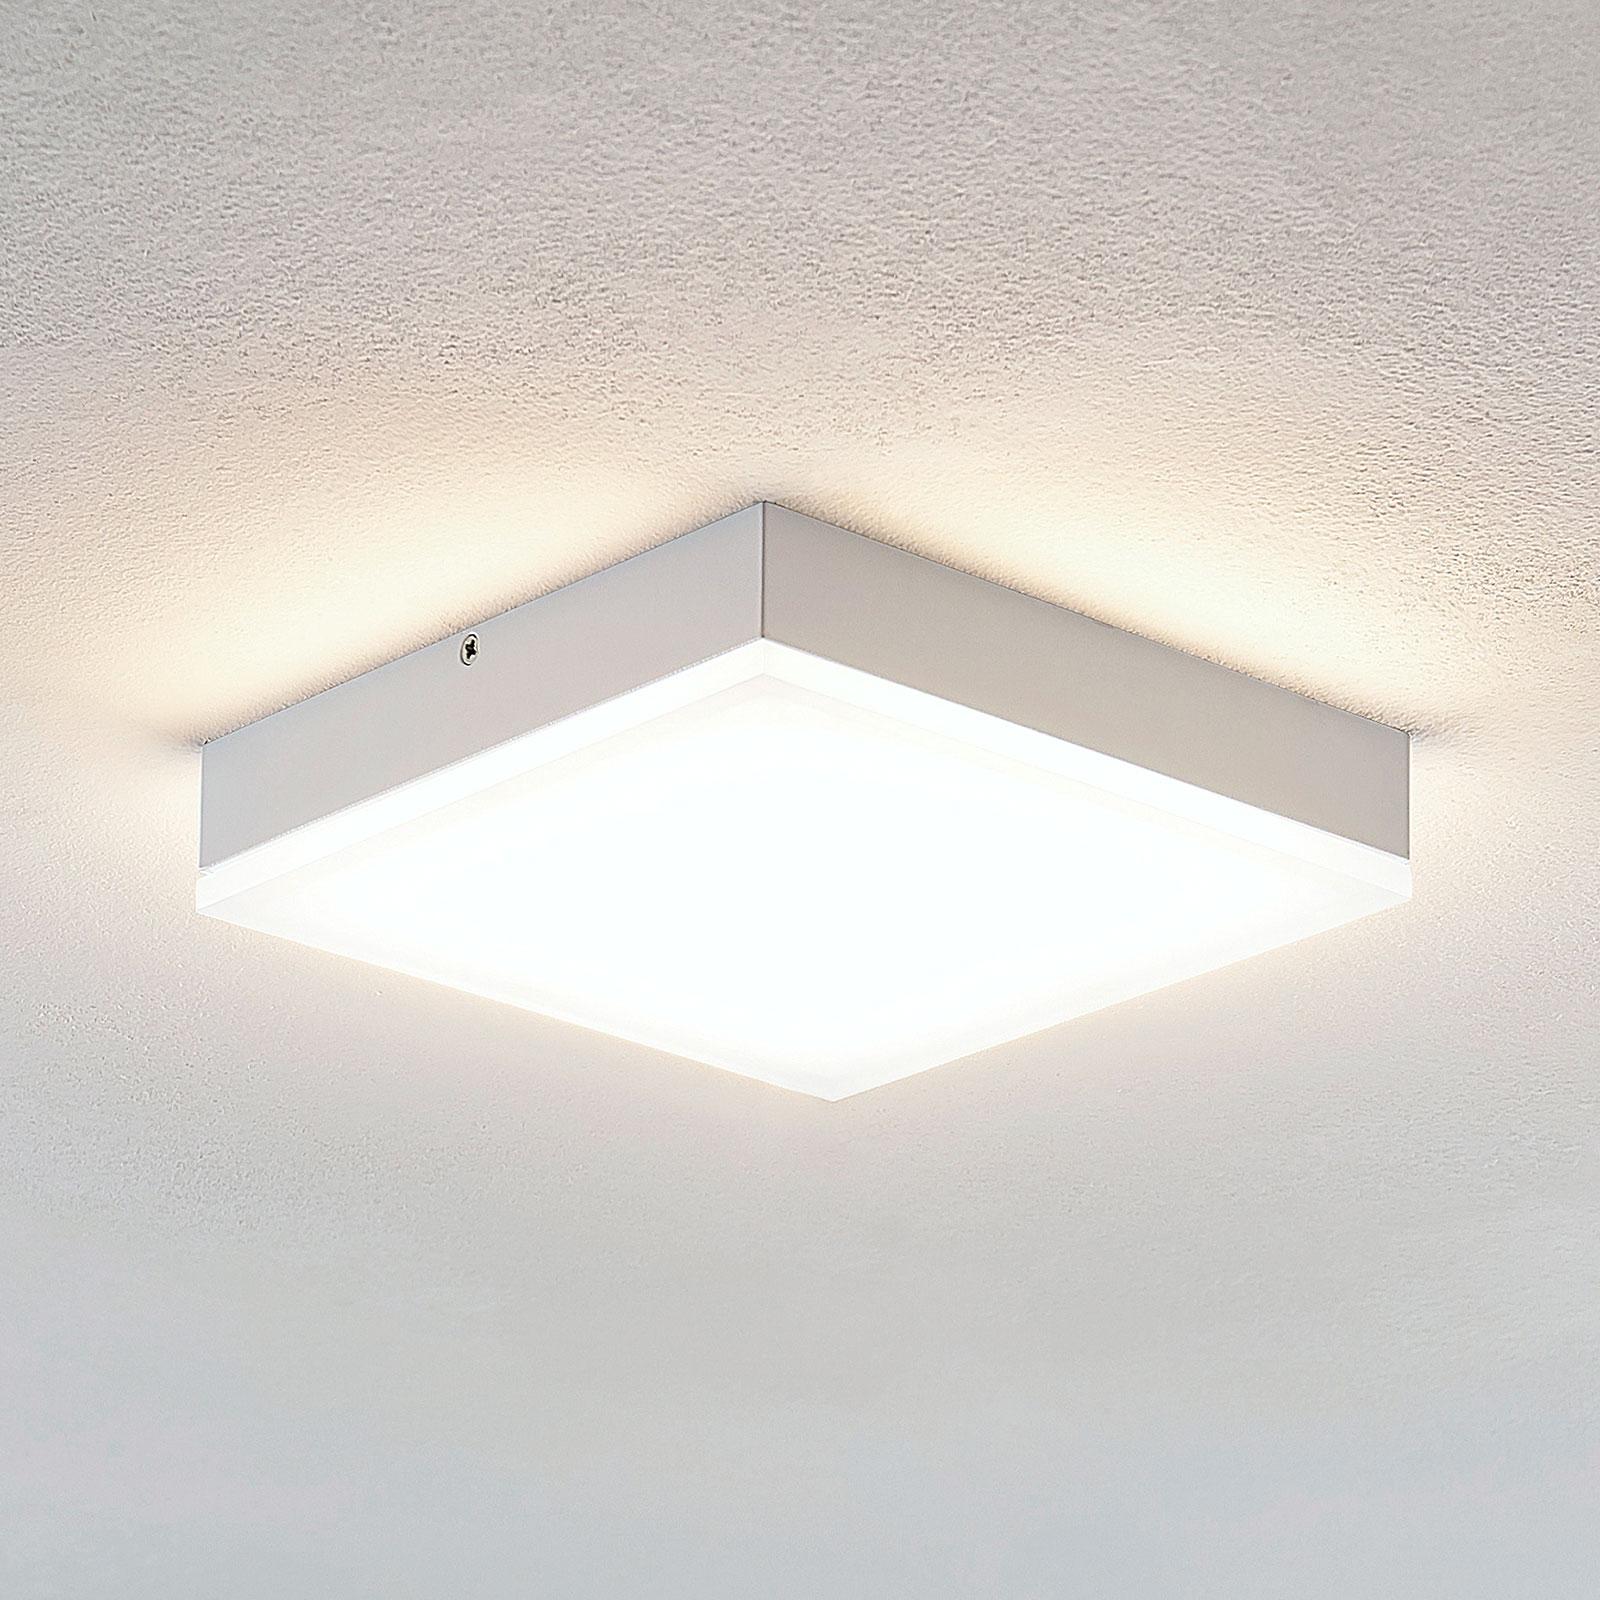 Lindby Tamito LED-Deckenlampe, weiß, 20 cm